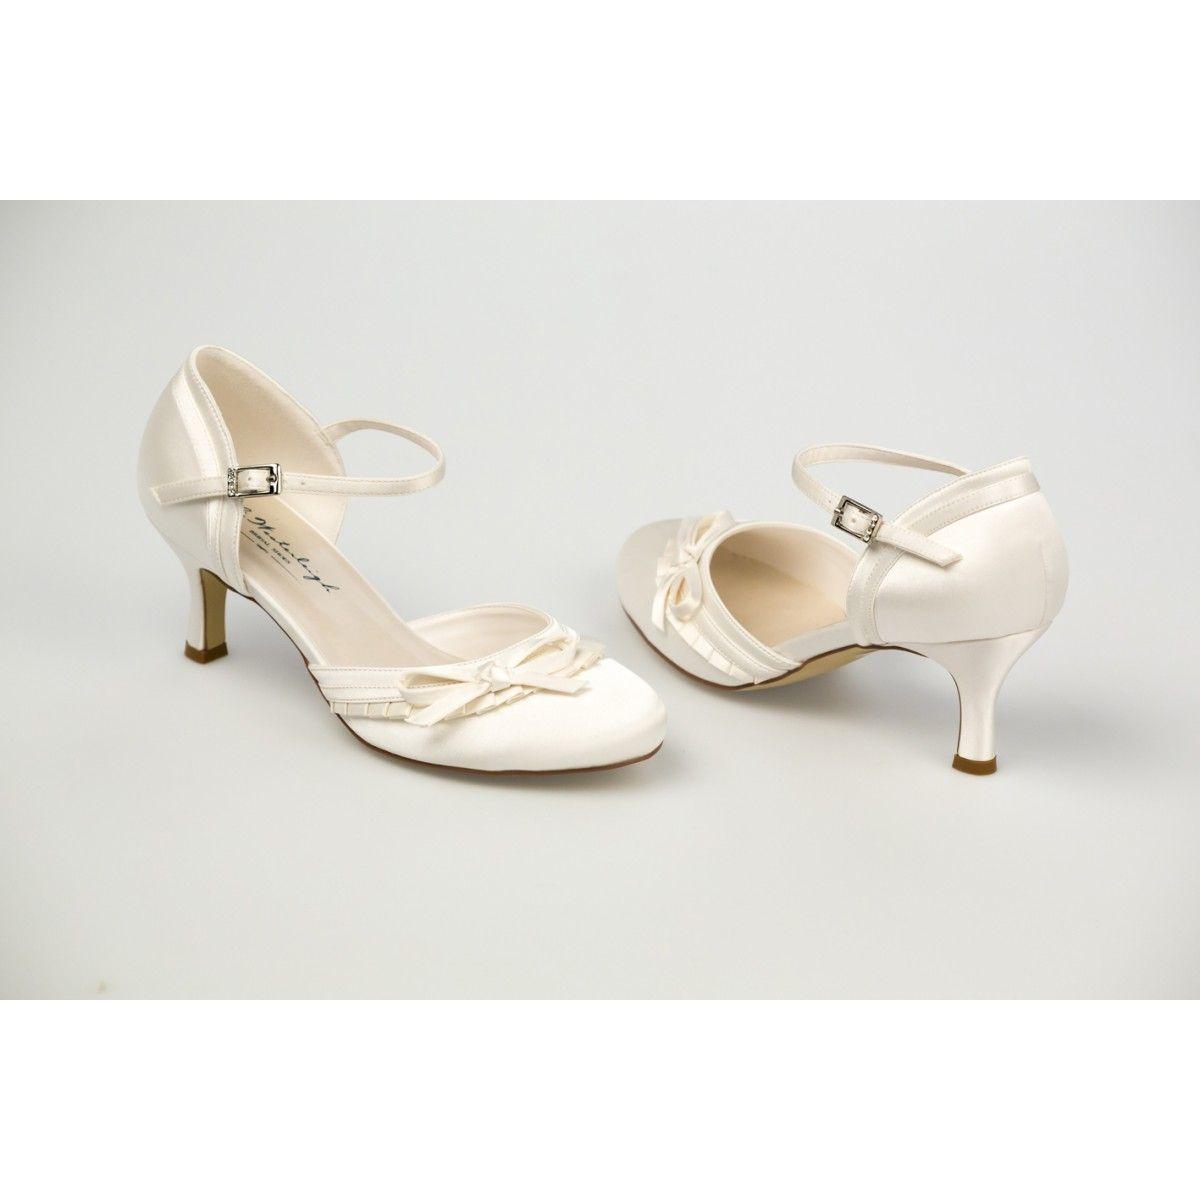 Satin Chaussures De Mariée En Talon Cm 6 rWdBCexo